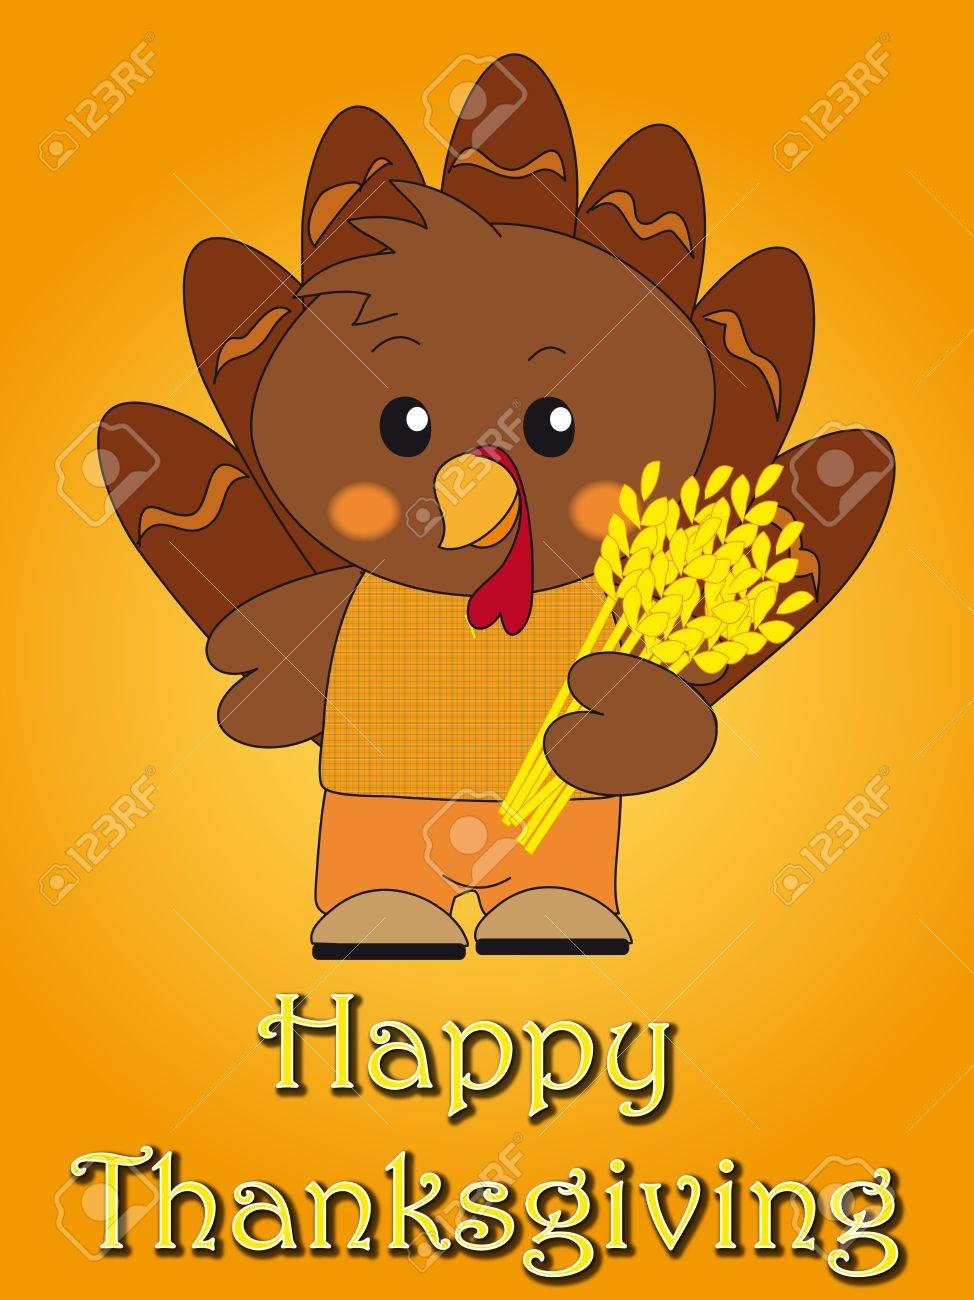 thanksgiving card Stock Photo - 14030835